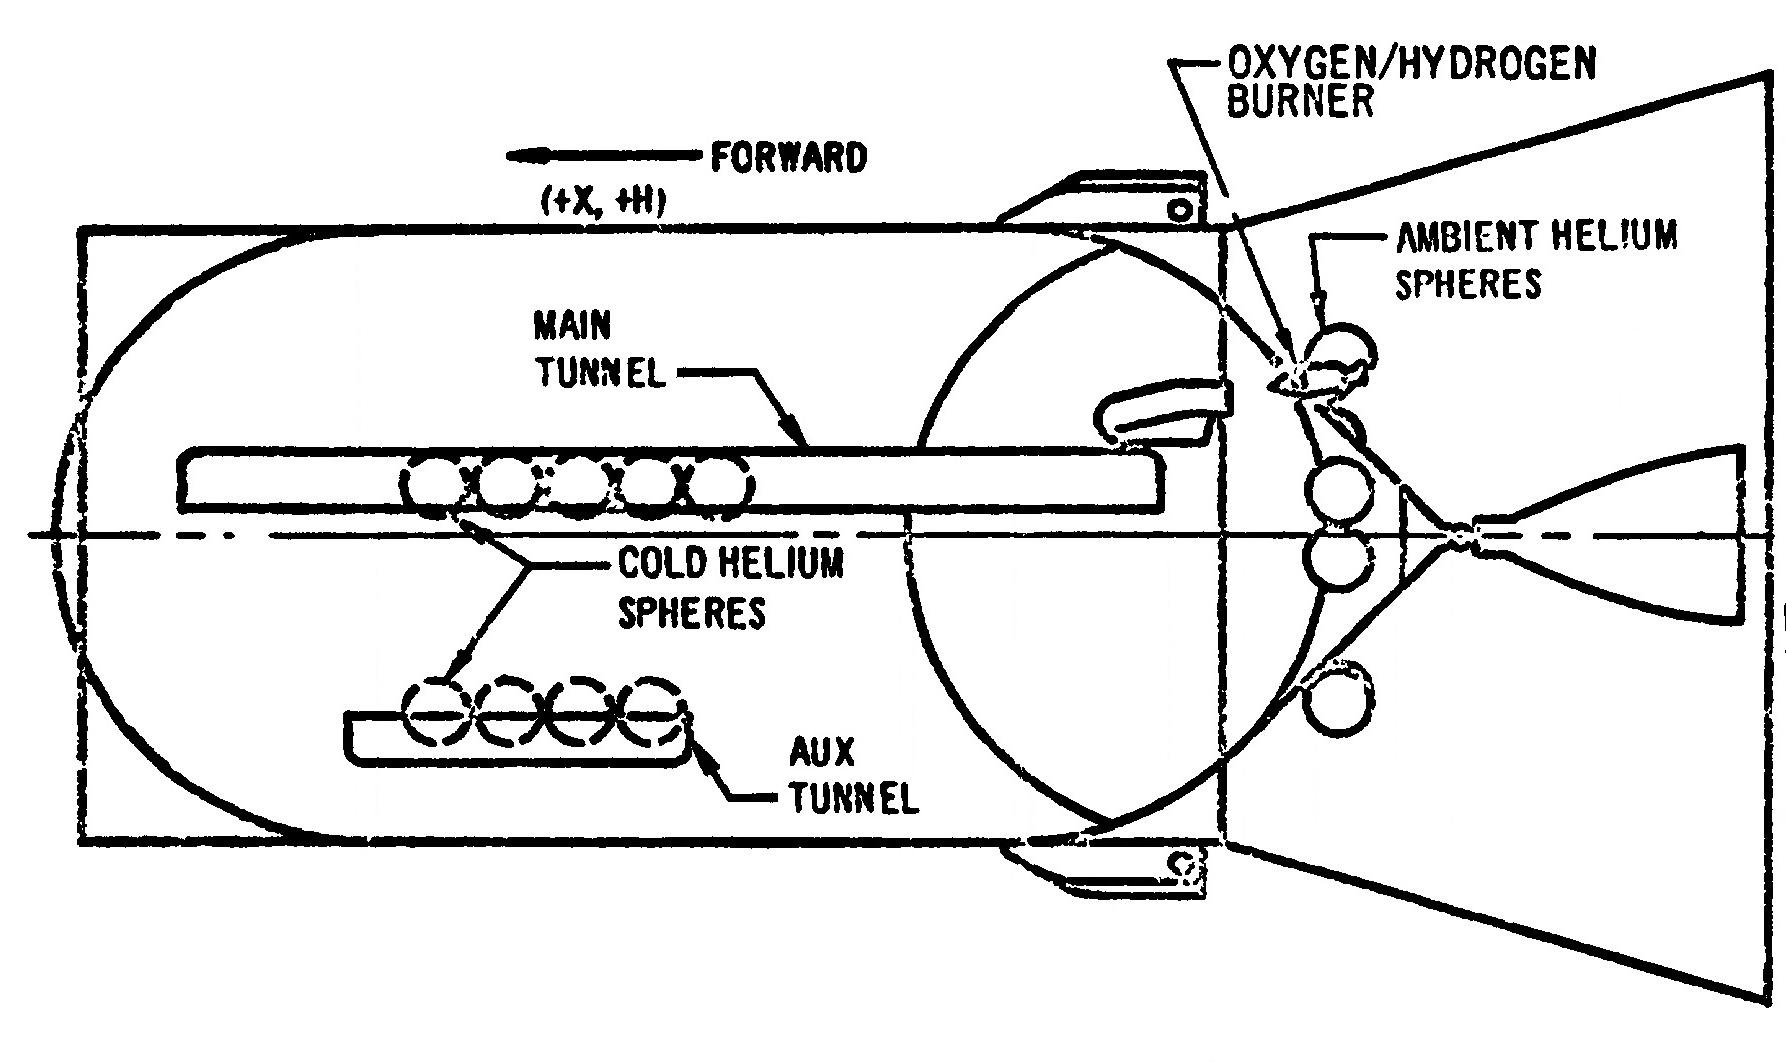 S Ivb Saturn V Propellant Tank Pressurization